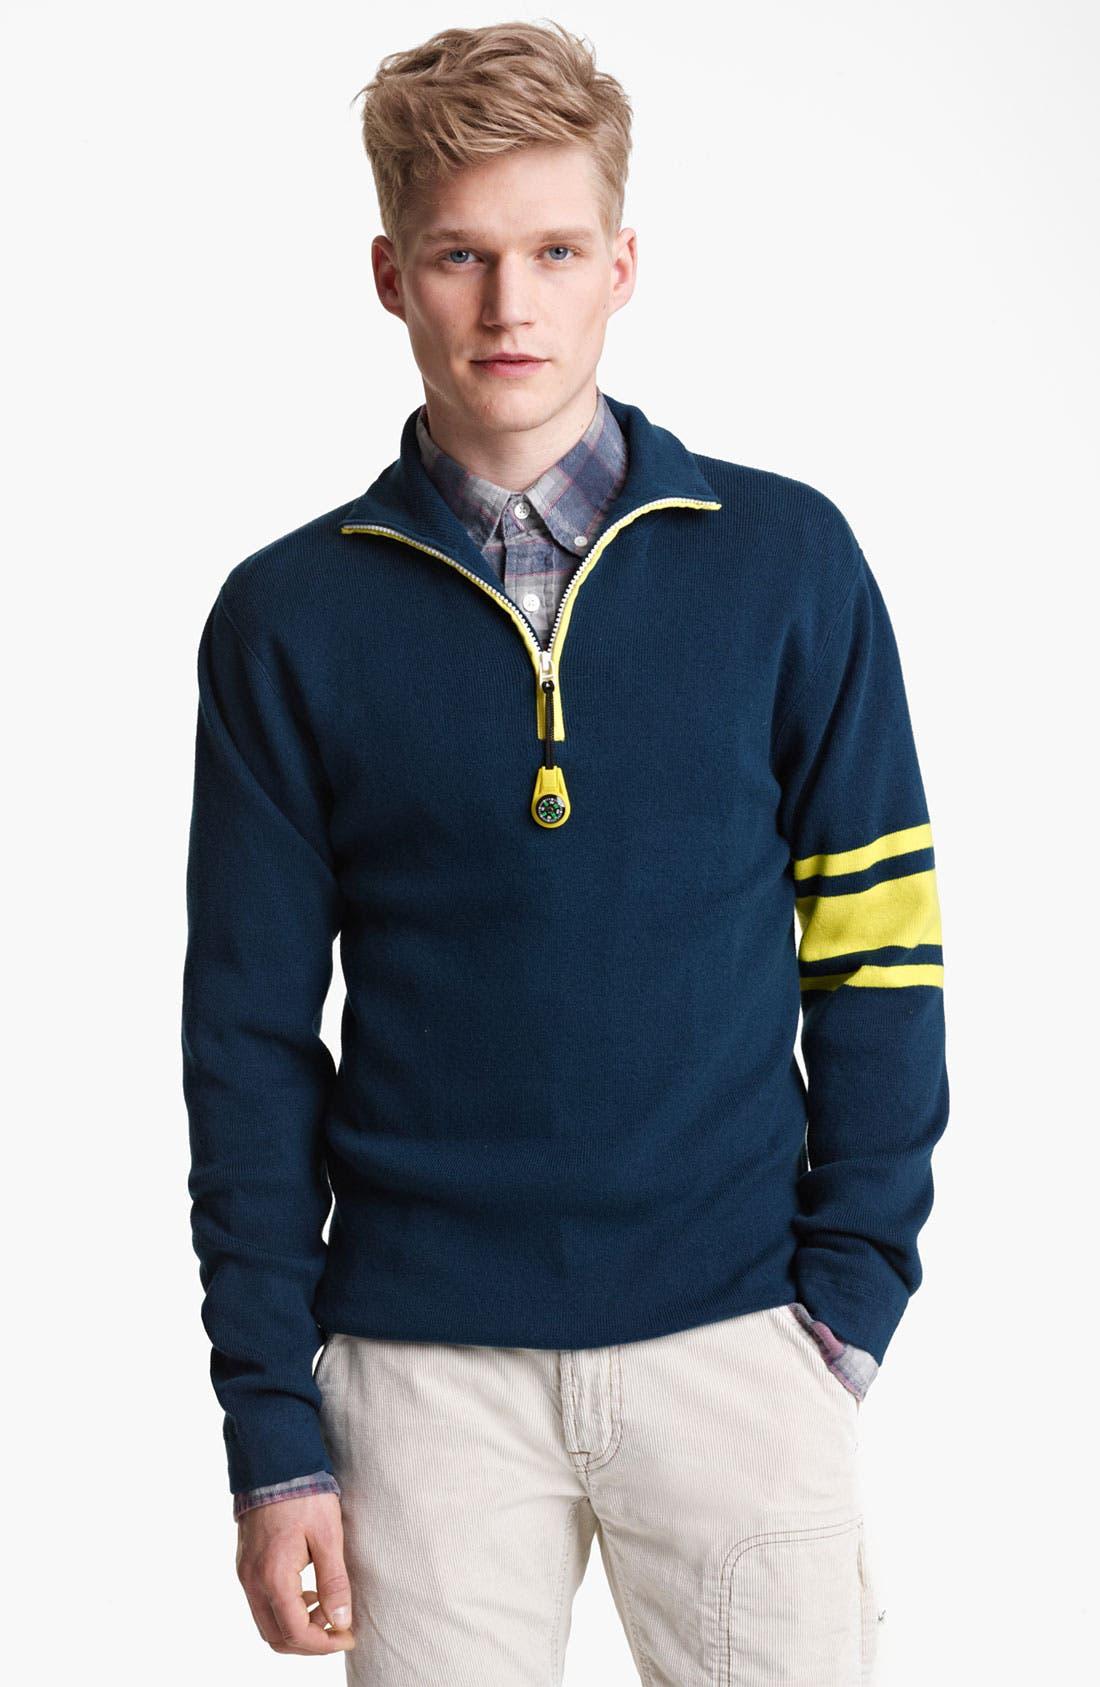 Main Image - Gant by Michael Bastian Quarter Zip Knit Pullover